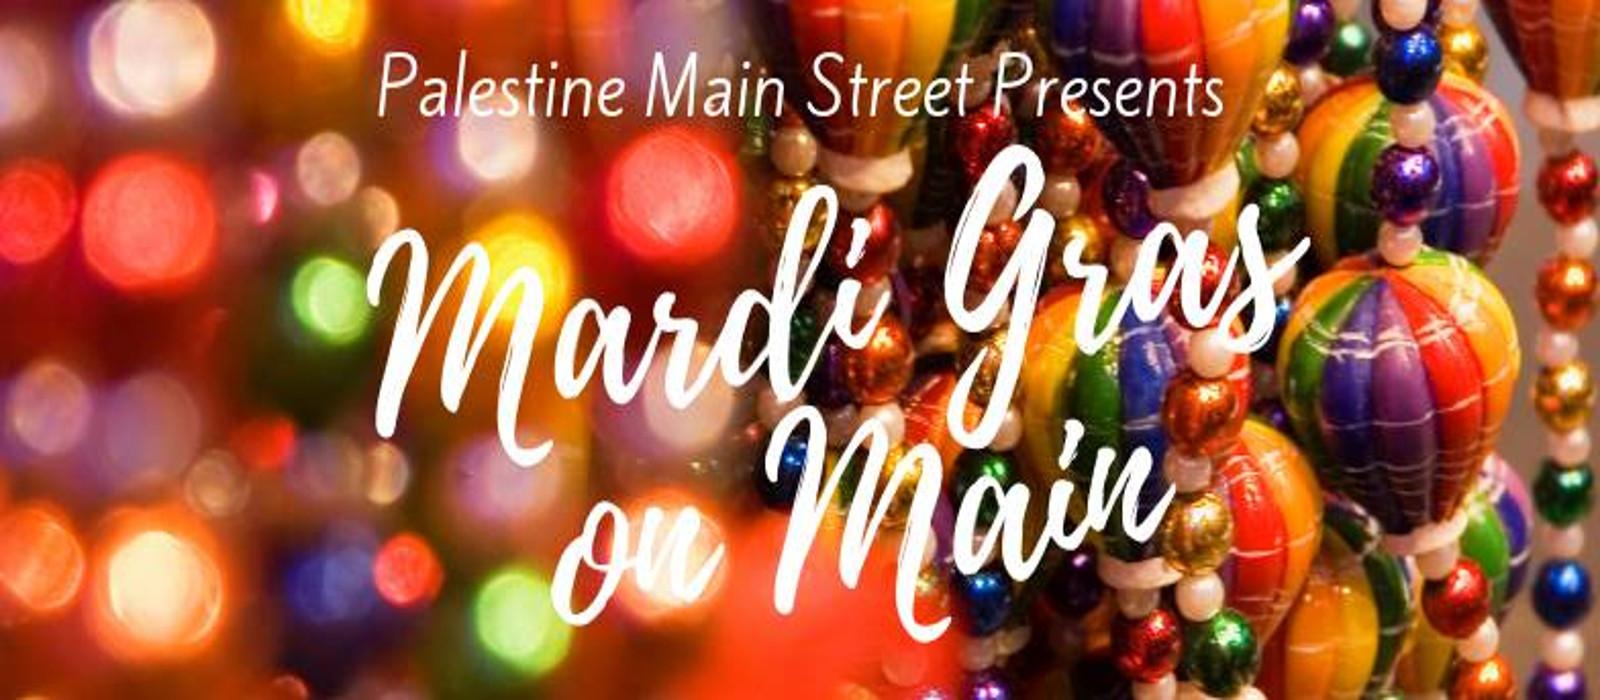 Mardi Gras on Main Street Brings Mardi Gras to You